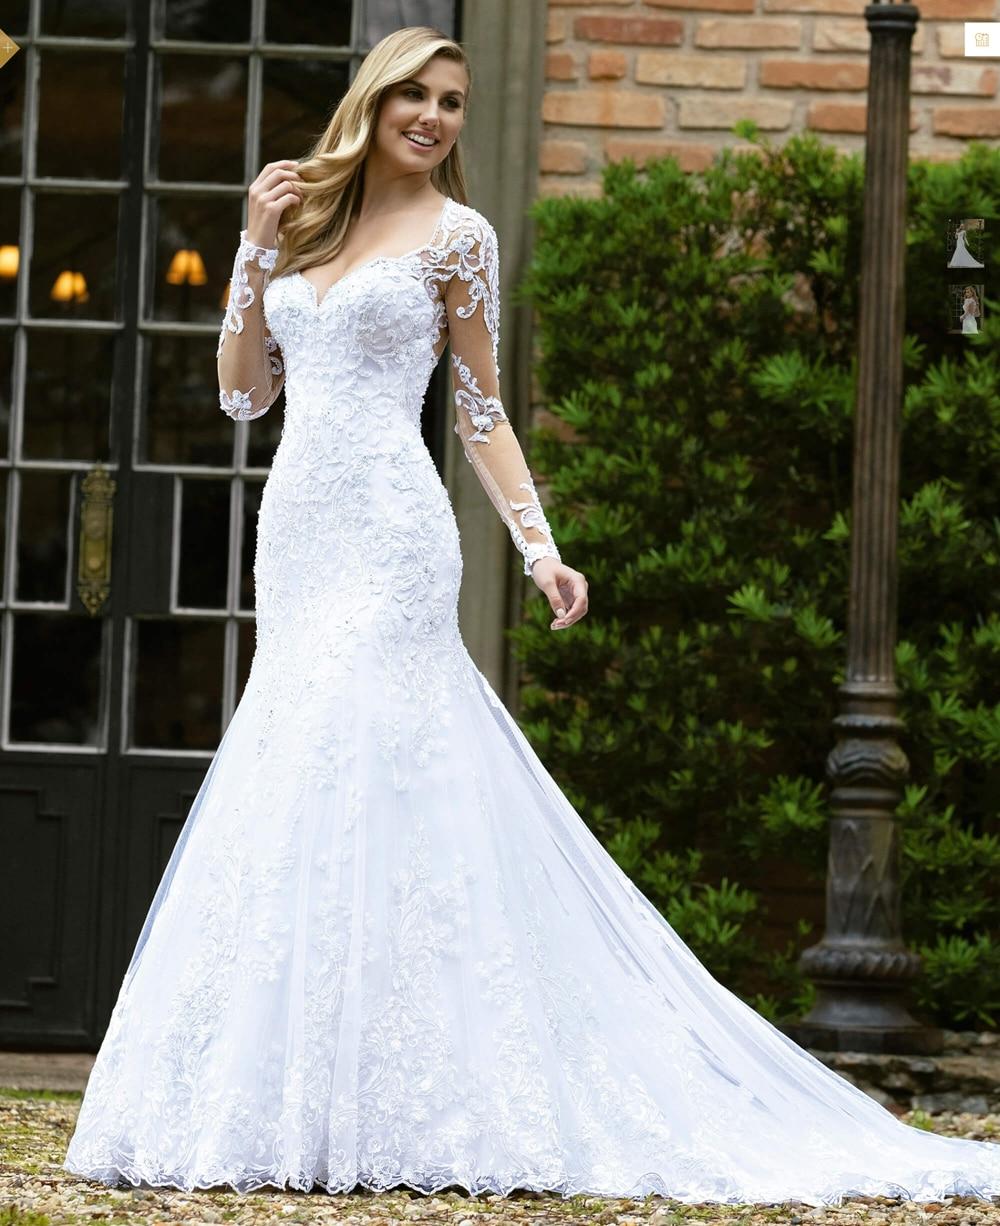 Vestidos De Novia 2019 Mermaid Wedding Dress With Sleeves Bridal Gown Dresses For Bride Custom Made To Order Superbweddingdress